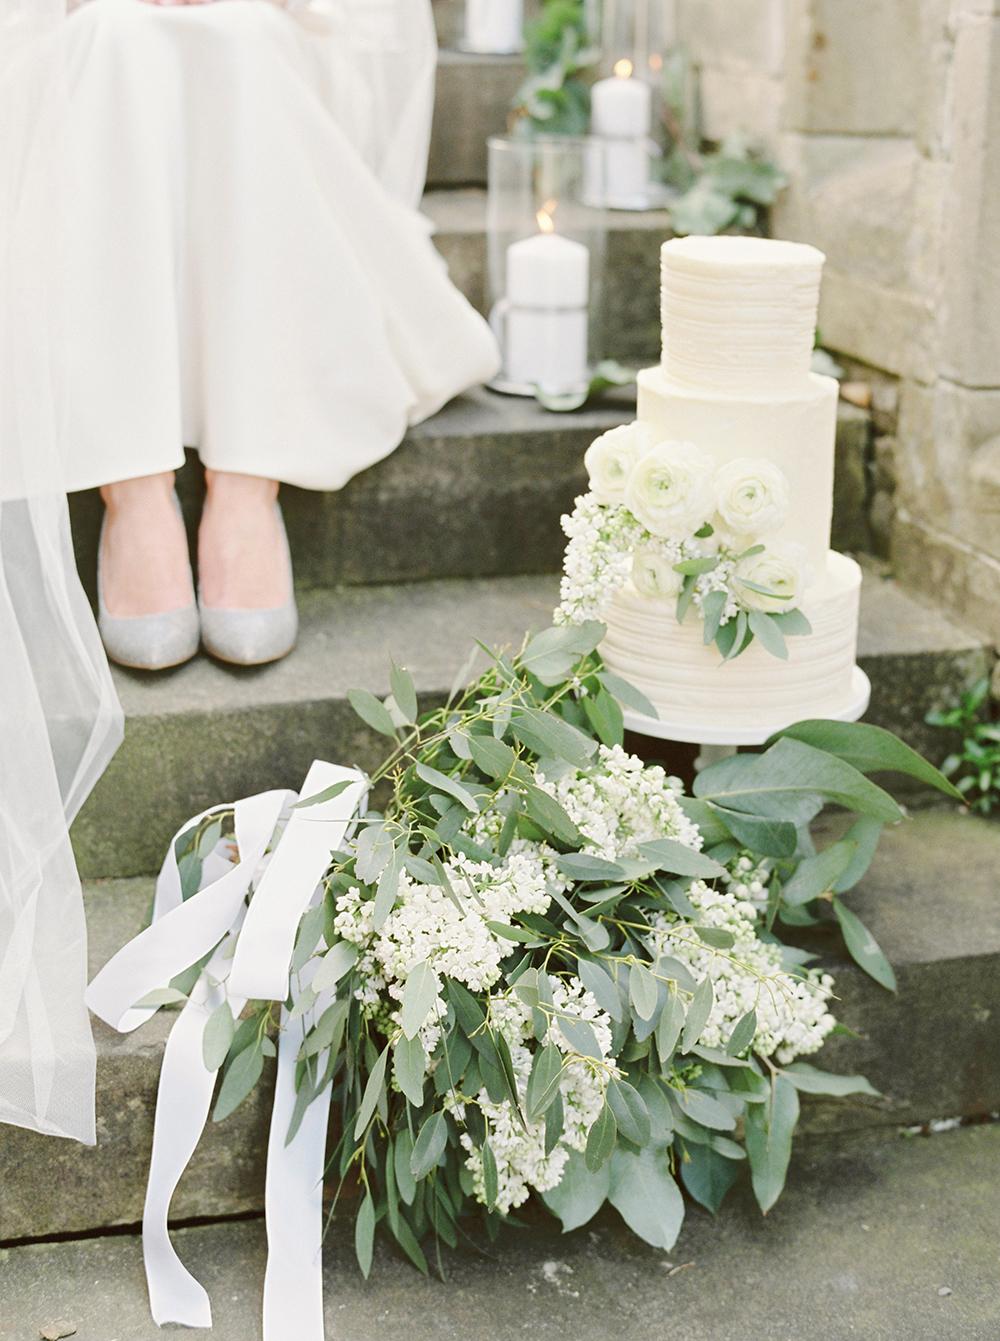 yorkshire wedding cake,fine art wedding cake,natural bouquet,